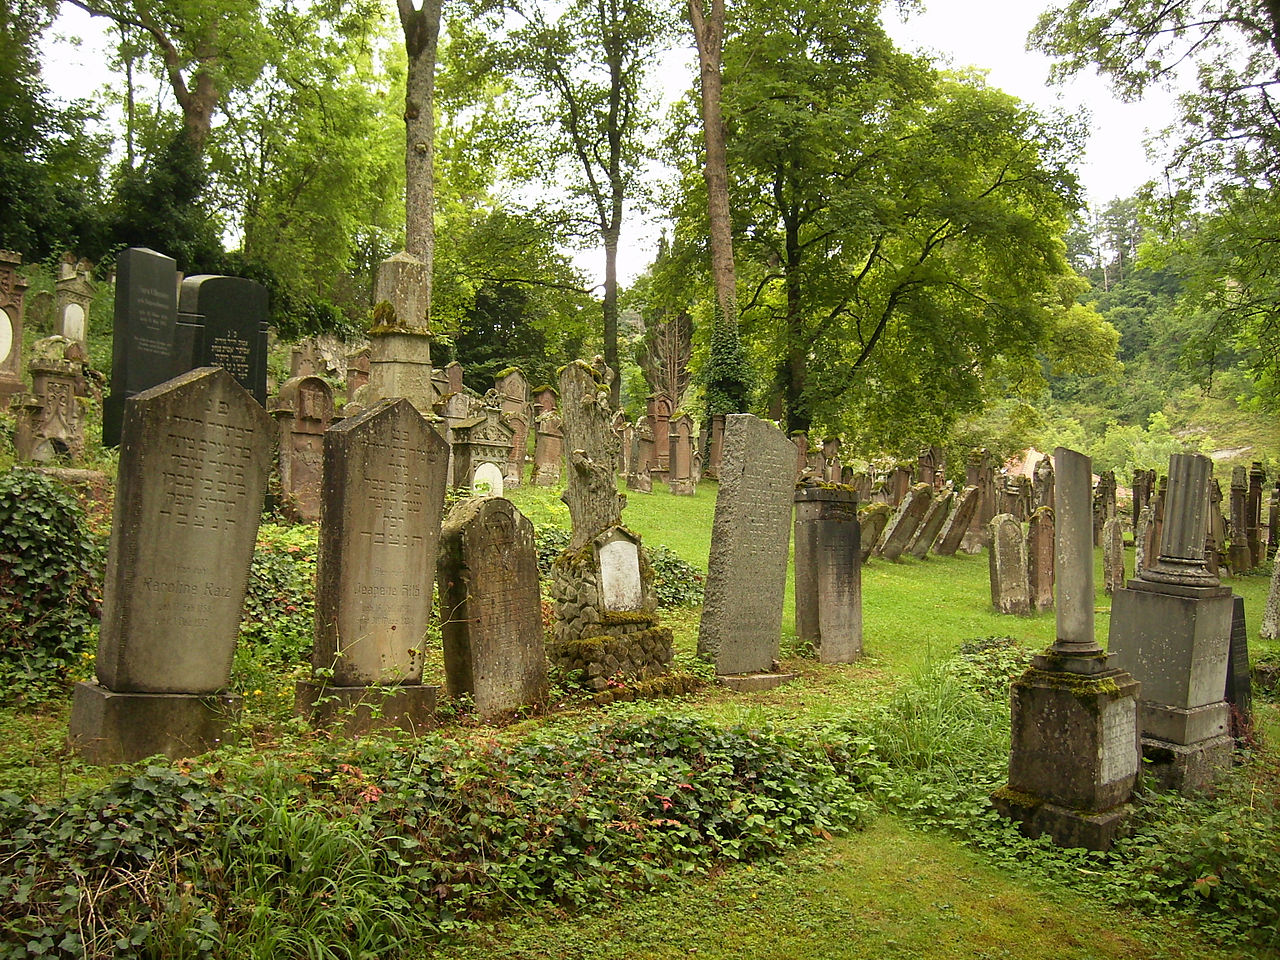 Haigerloch Jüdischer Friedhof3547.jpg